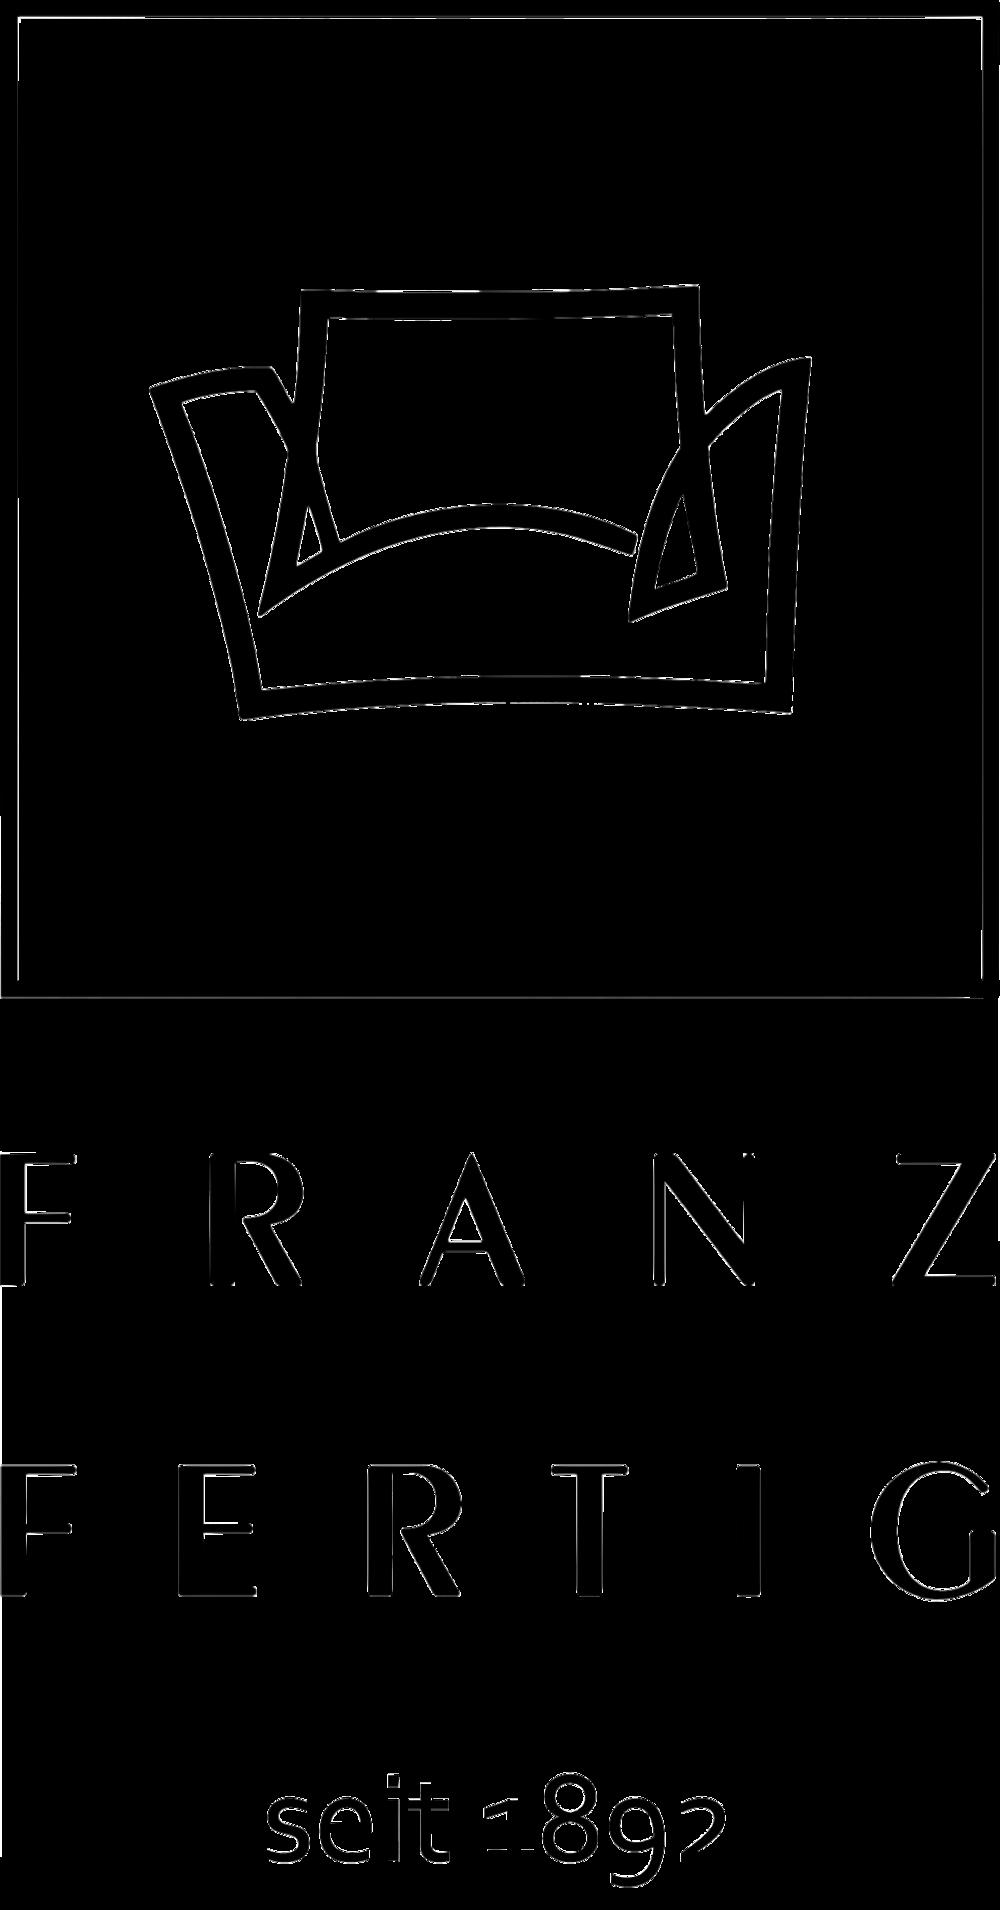 FF_Logo_seit_1892_300dpi.png